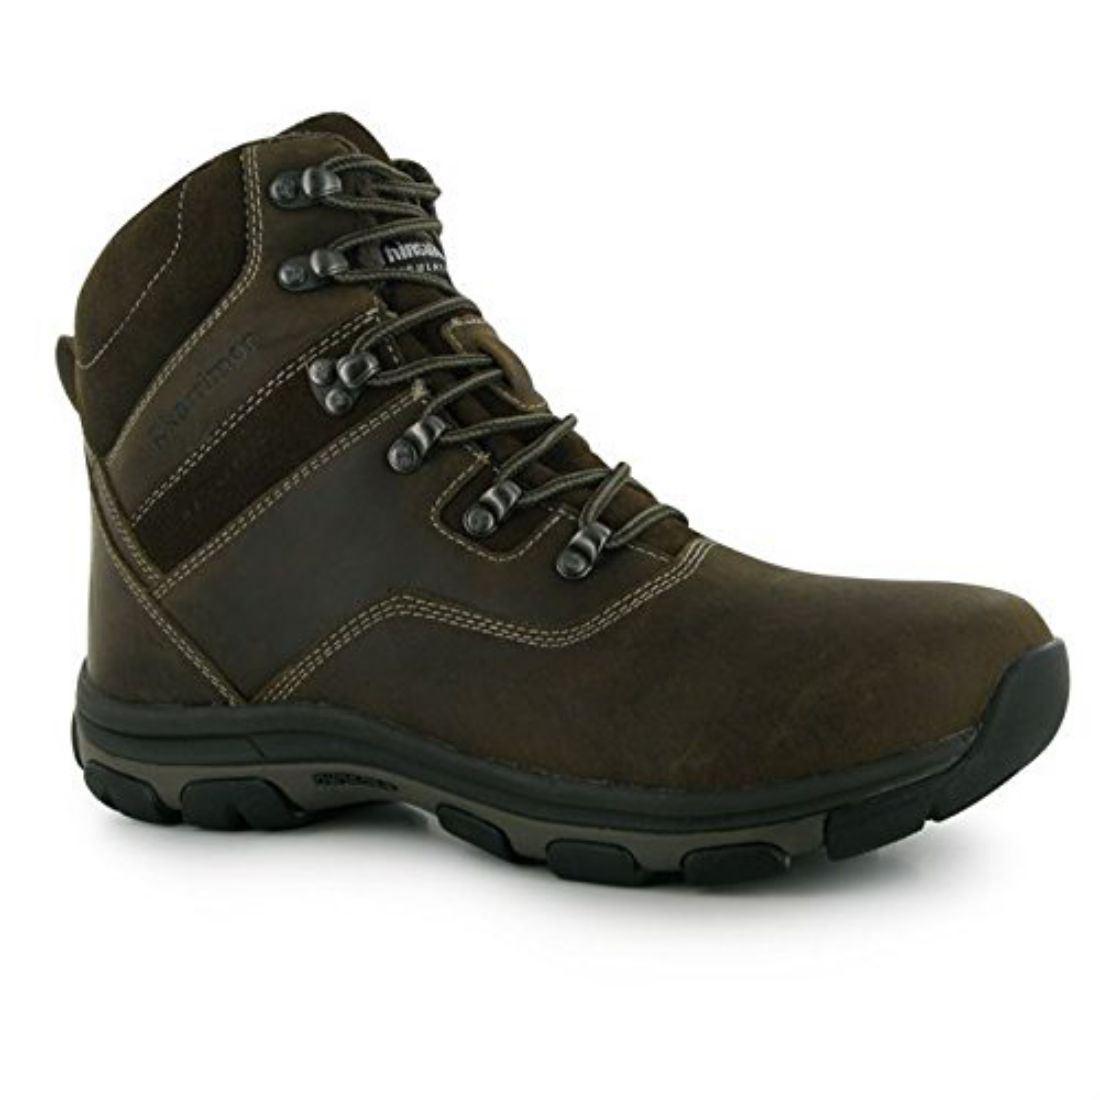 karrimor mens barney snow boots winter shoes waterproof